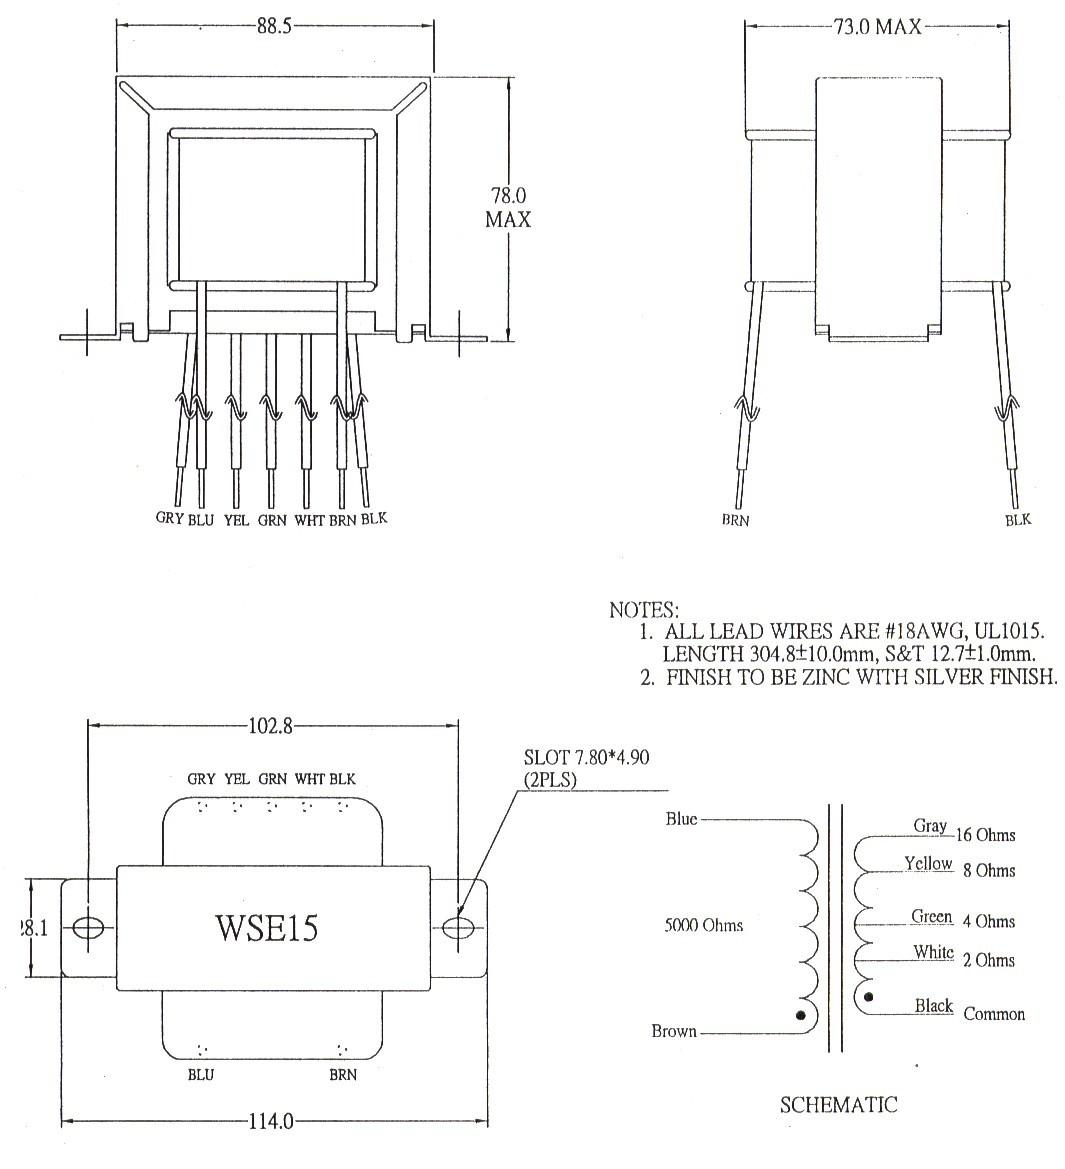 Mercury Magnetics Wiring Diagram Free For You Verado Smartcraft 49 Auto Mobile Diagrams Library Rh 77 Codingcommunity De 5e3